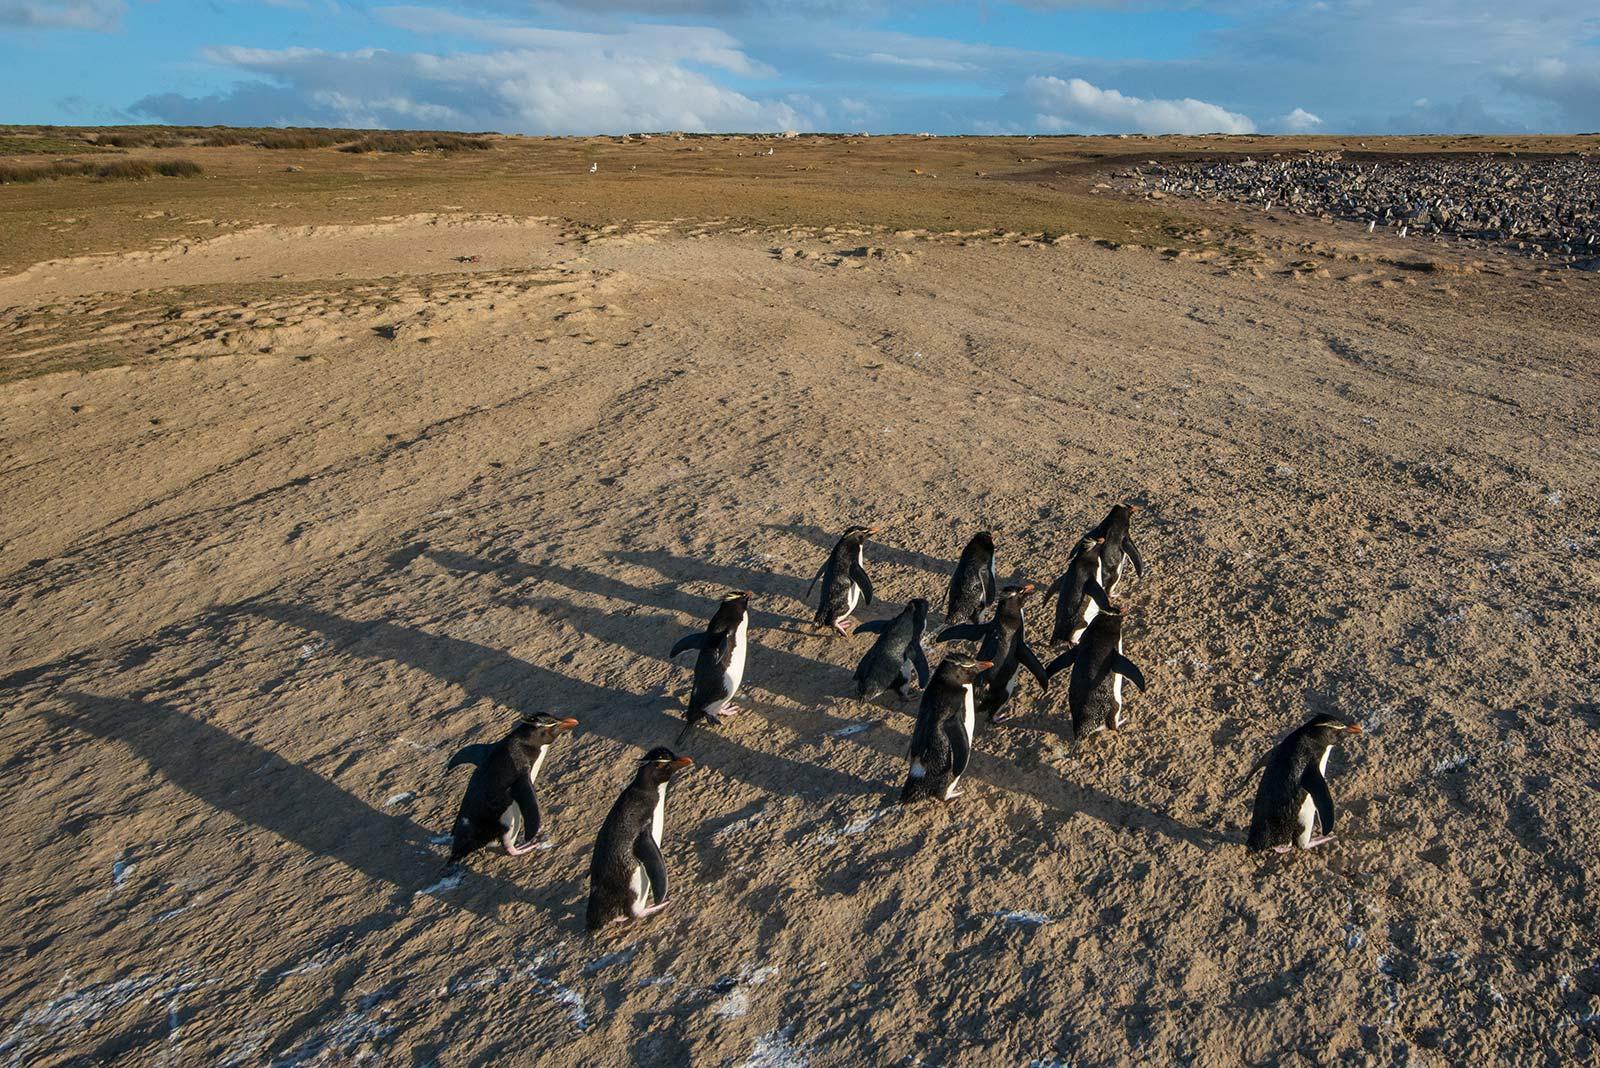 Unprotected: Rockhoppers - Falkland Islands/Islas Malvinas